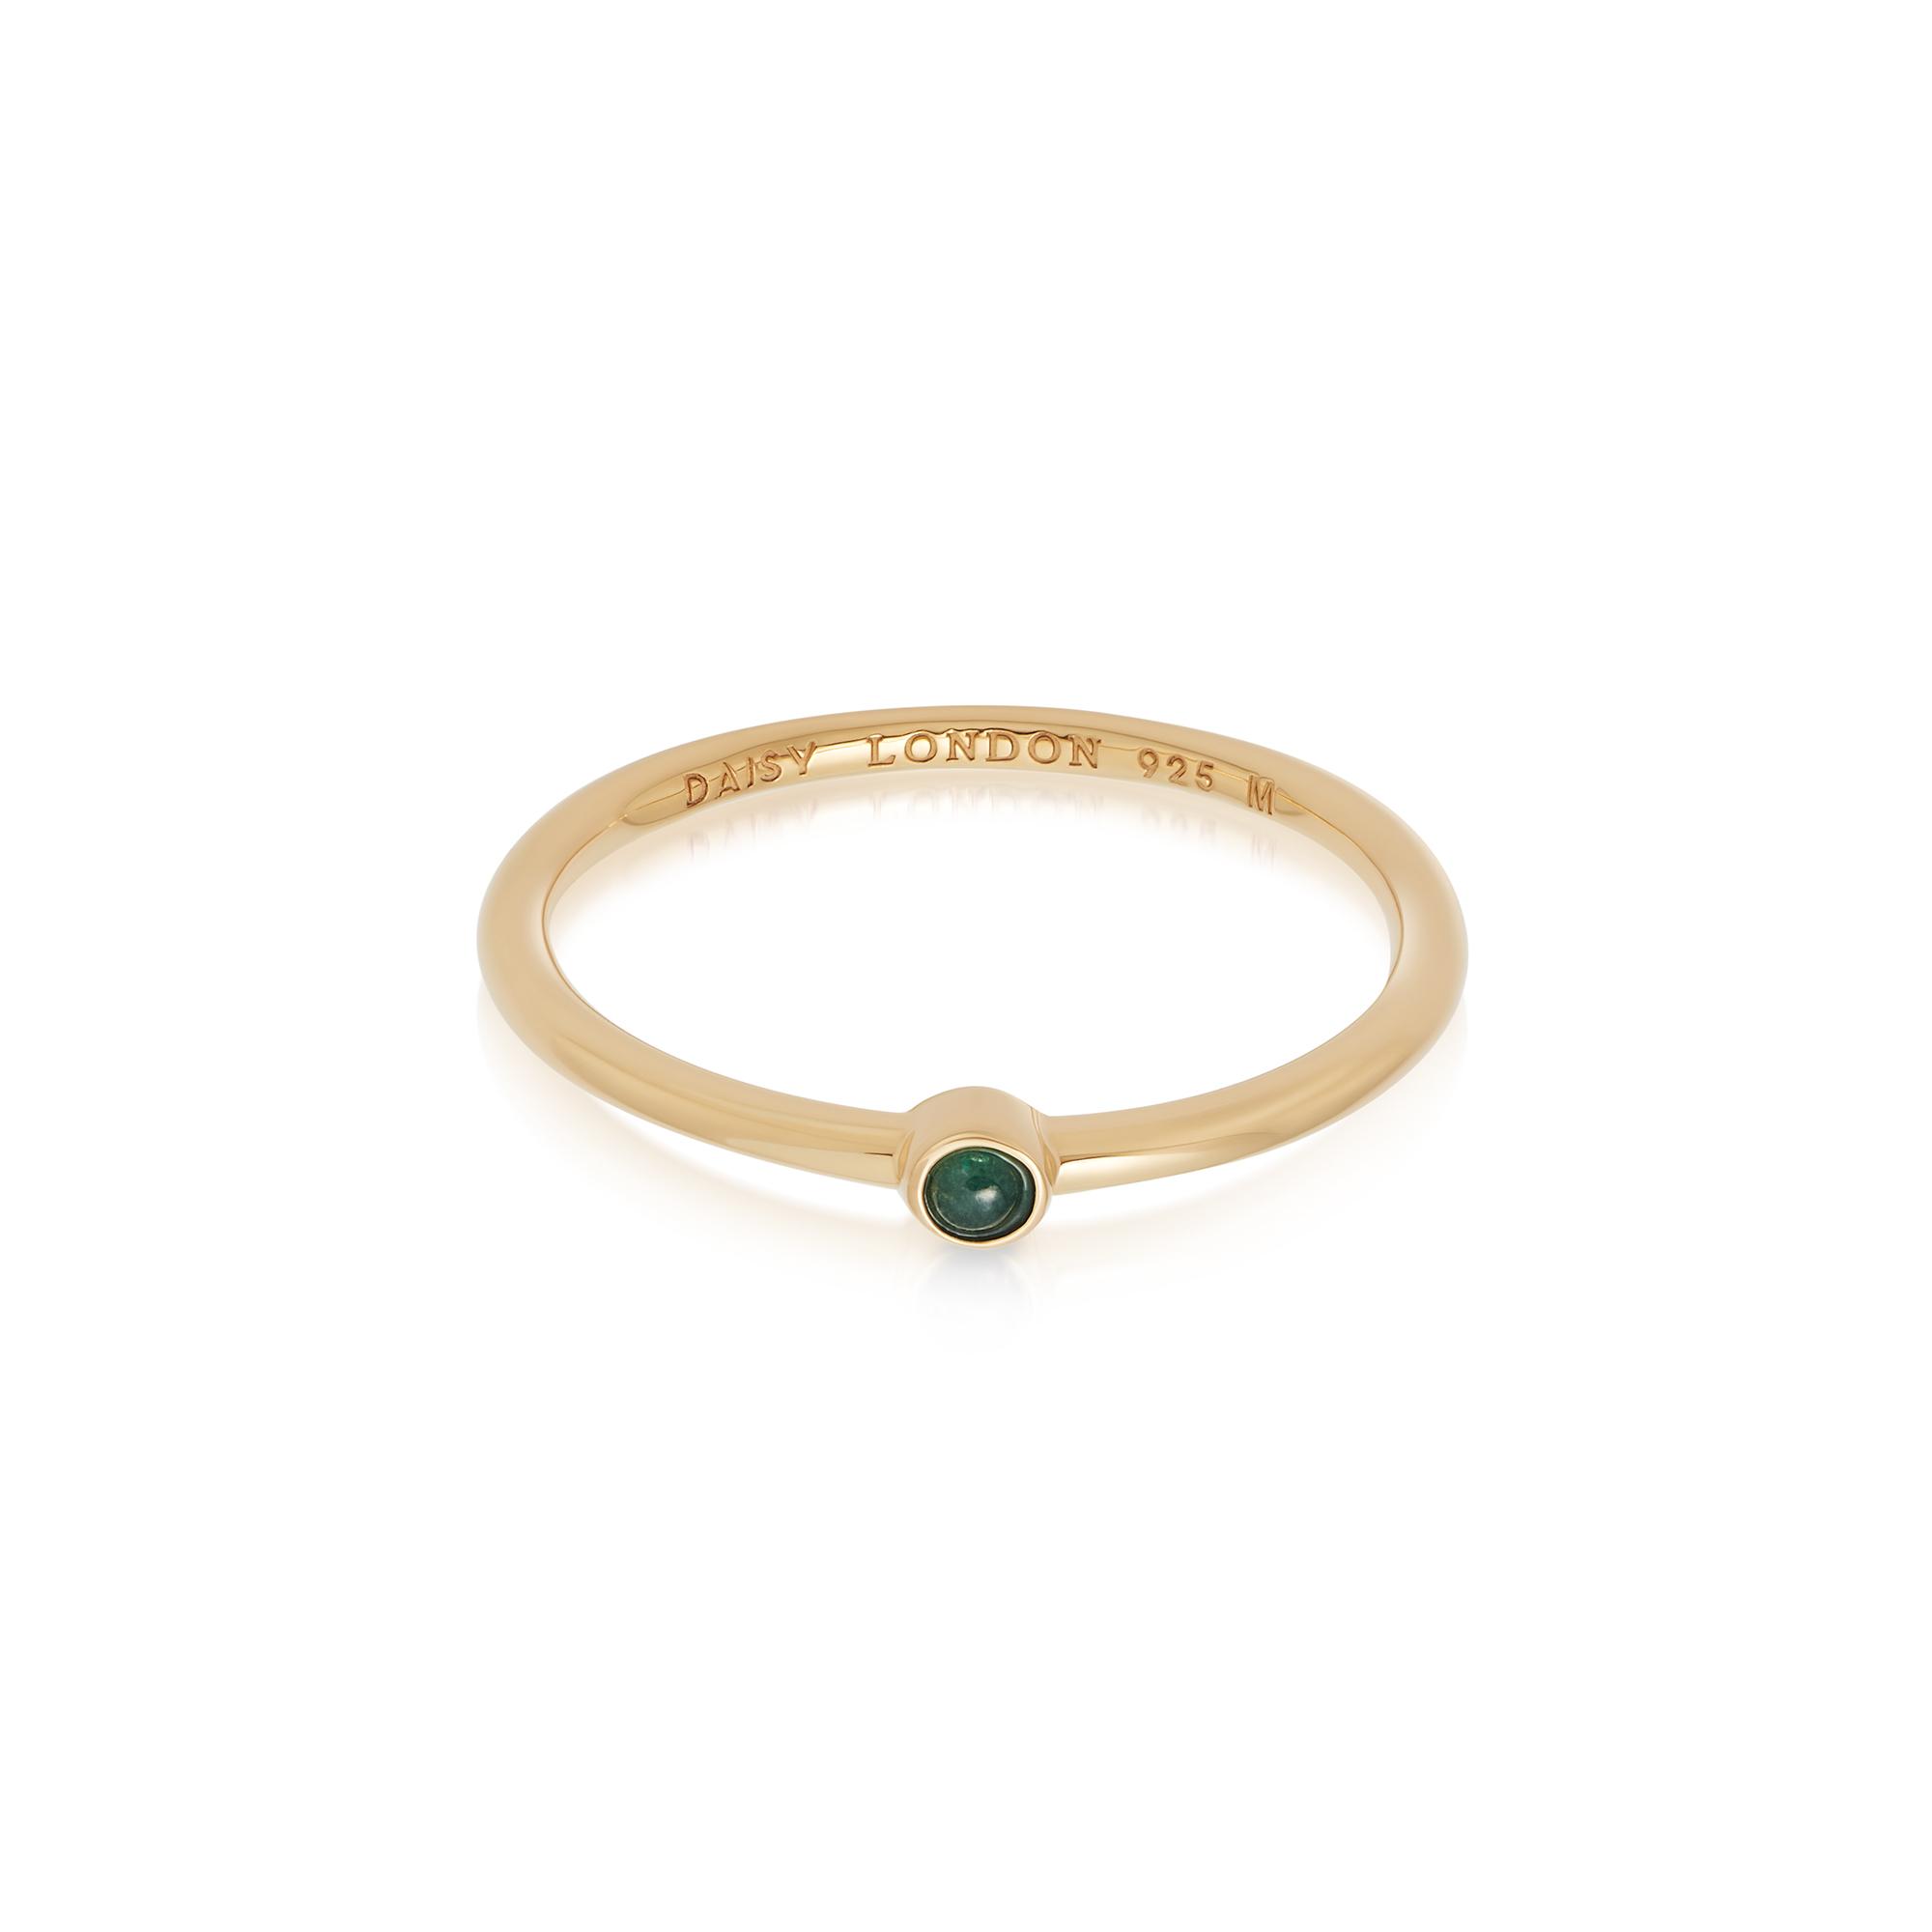 Green Aventurine Healing Stone Ring 18Ct Gold Plate S